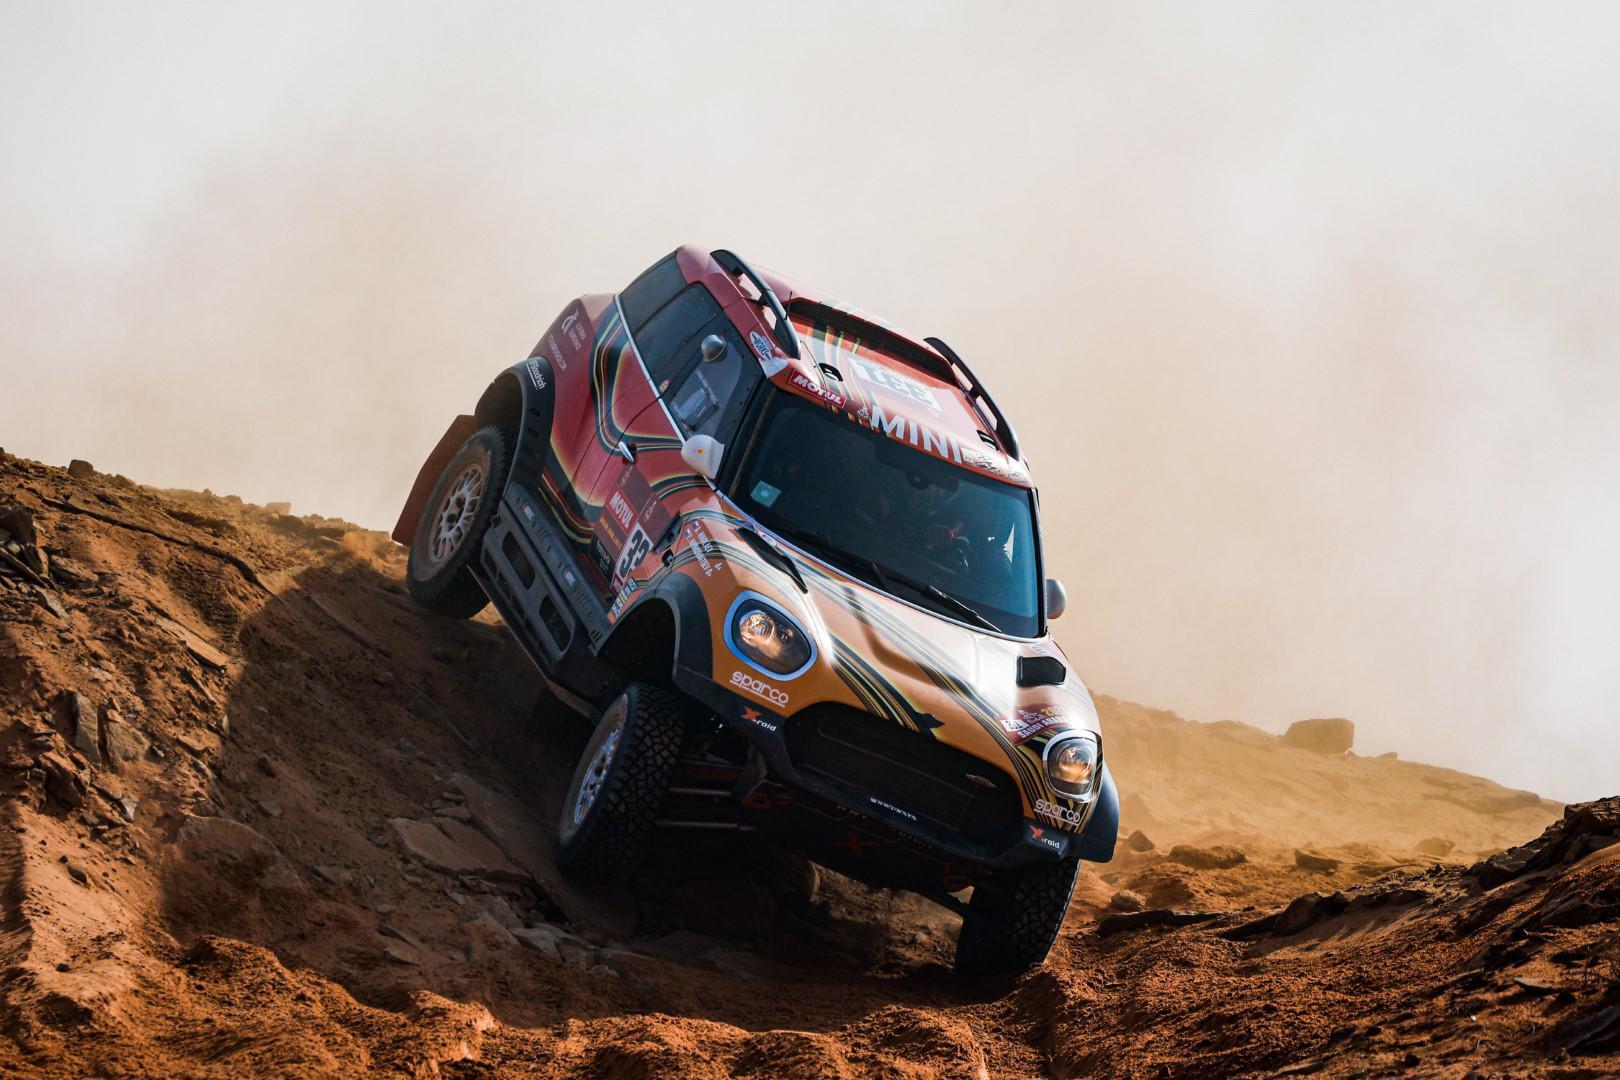 rally-dakar-2021-6eme-victoire-au-general-pour-mini-1416-8.jpg